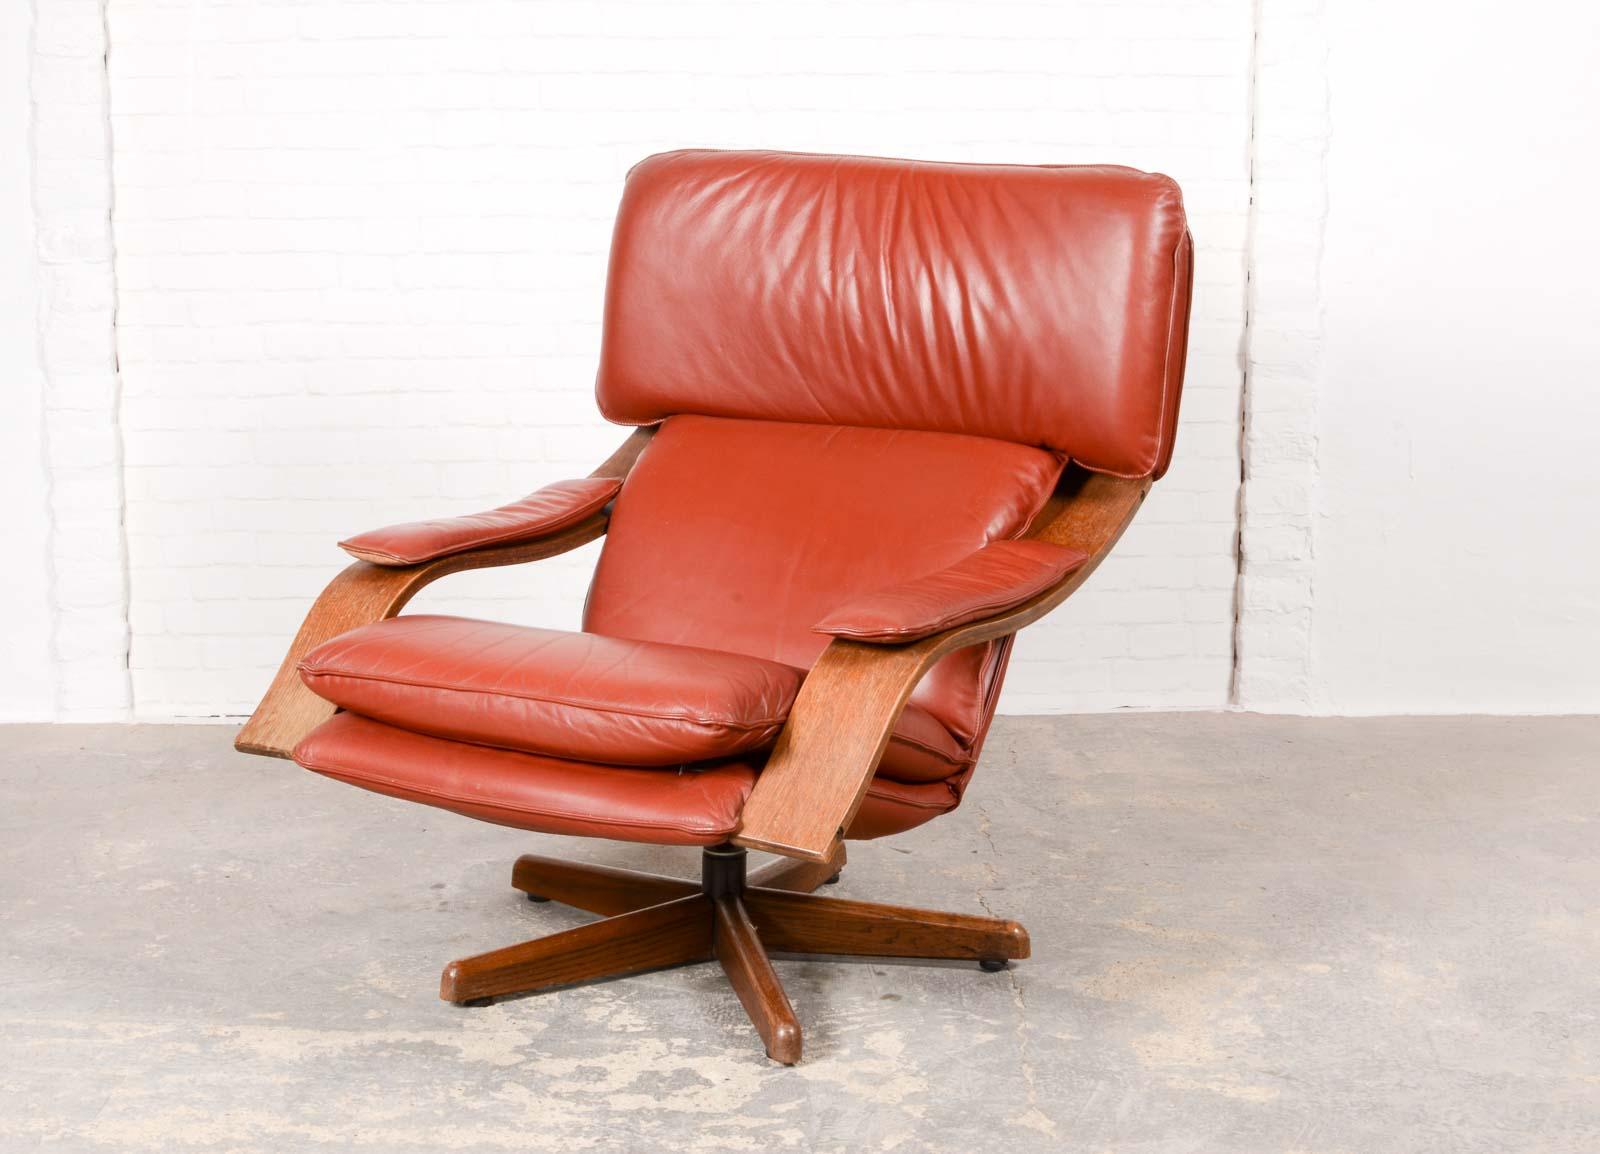 Cool Majestic Mid Century Scandinavian Swivel Relax Lounge Chair Ibusinesslaw Wood Chair Design Ideas Ibusinesslaworg